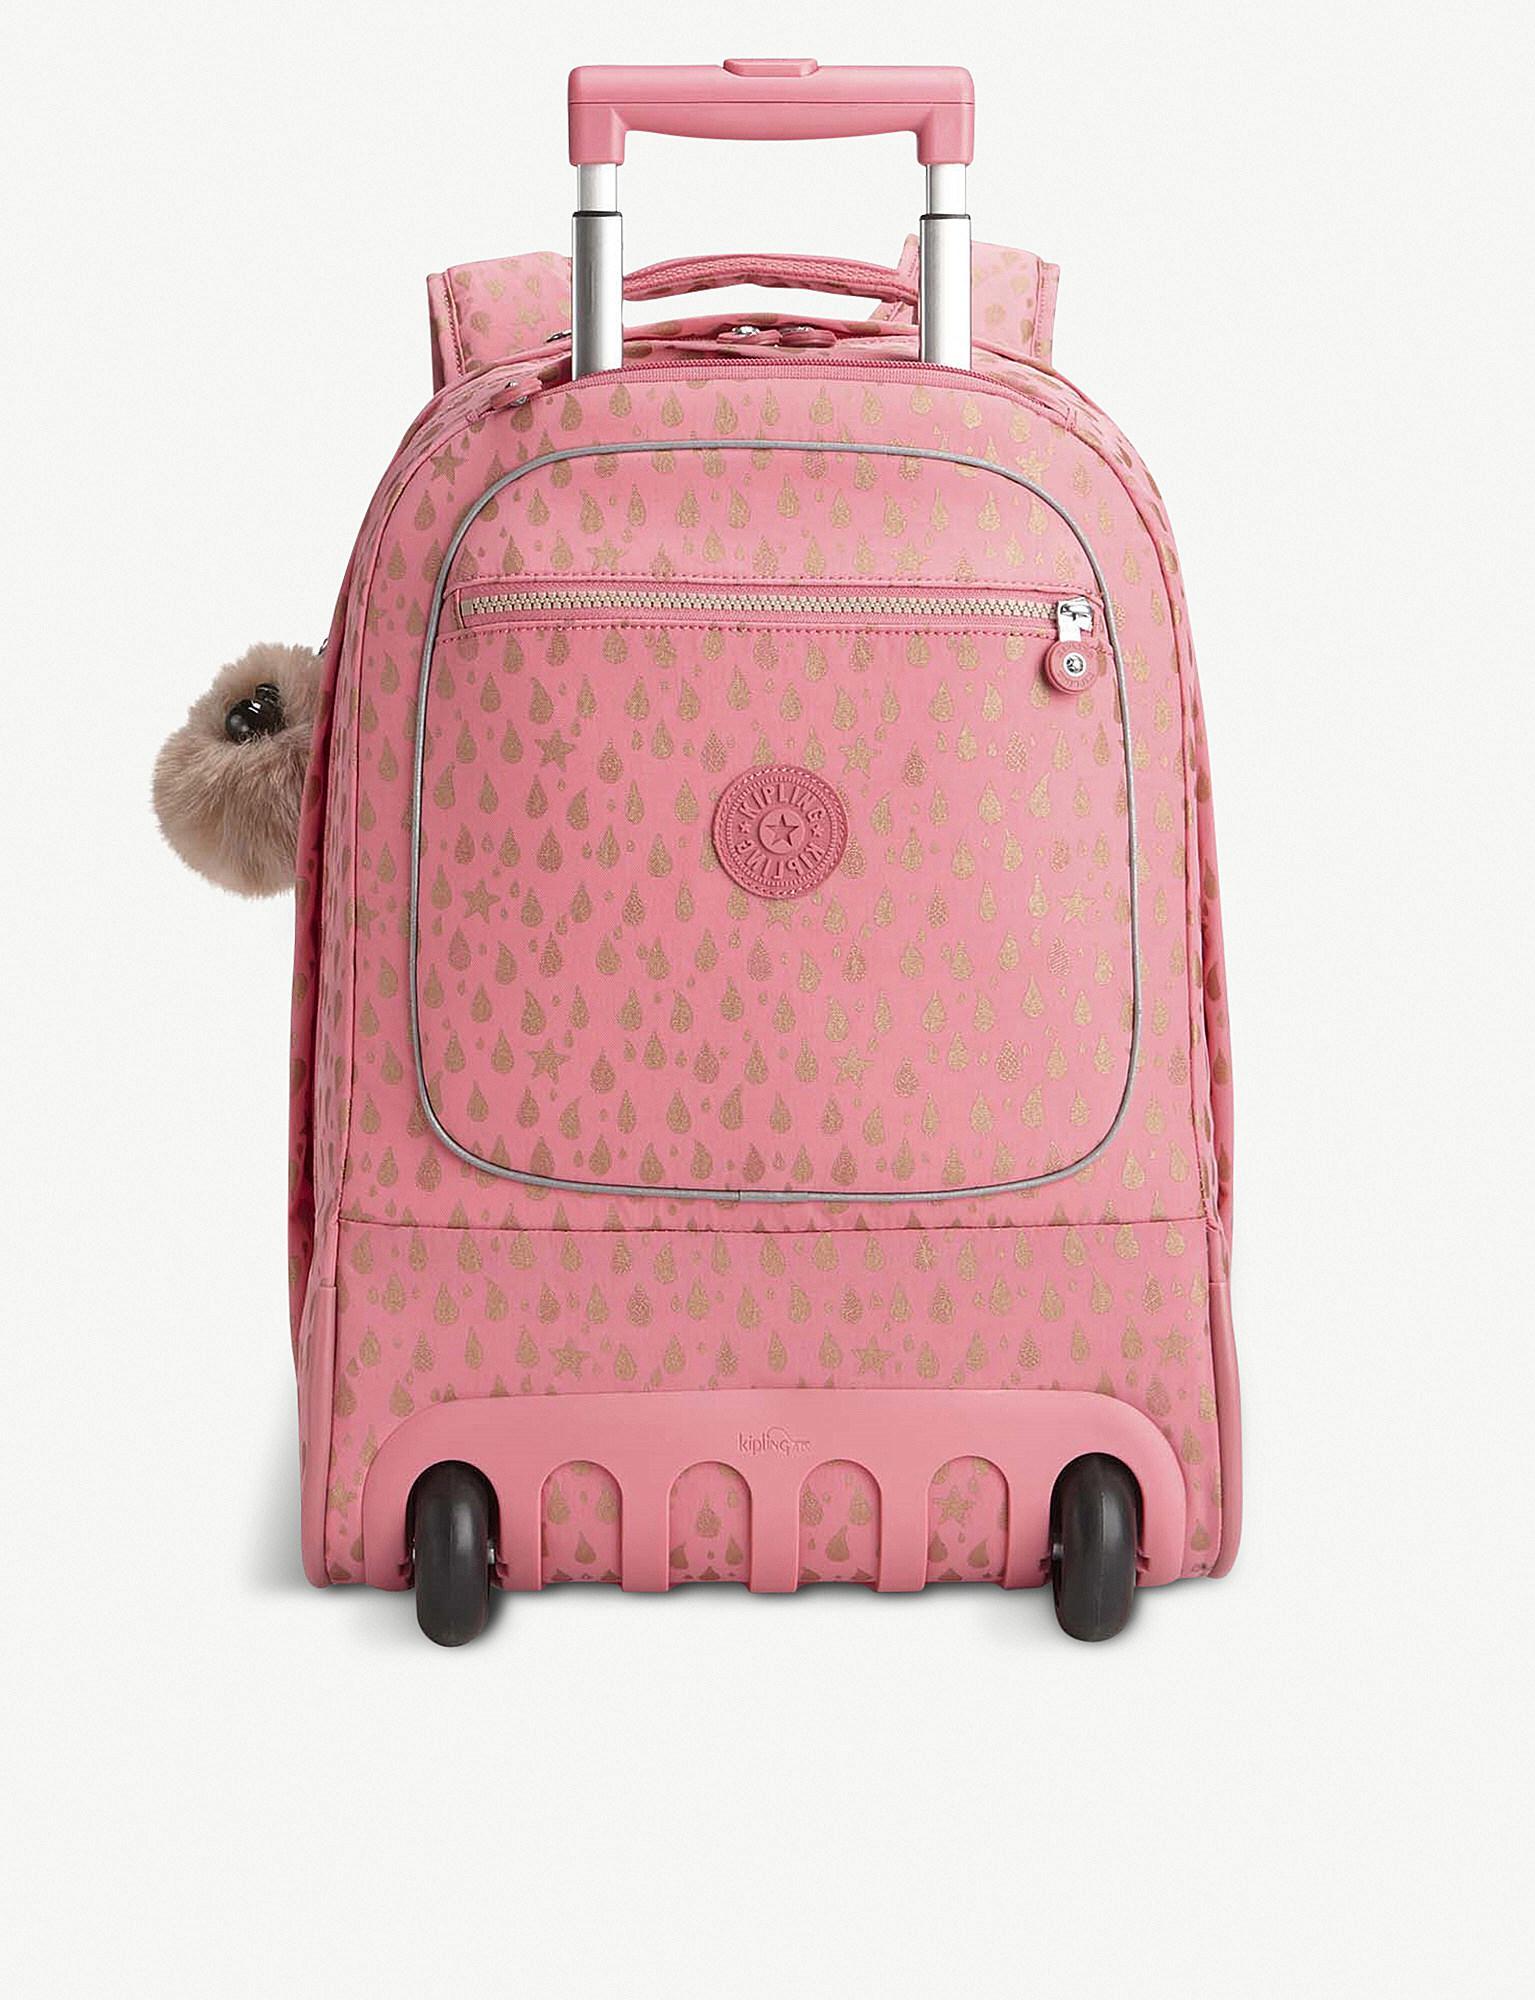 68c5d06c7 Kipling Clas Soobin Wheeled Backpack in Pink - Lyst